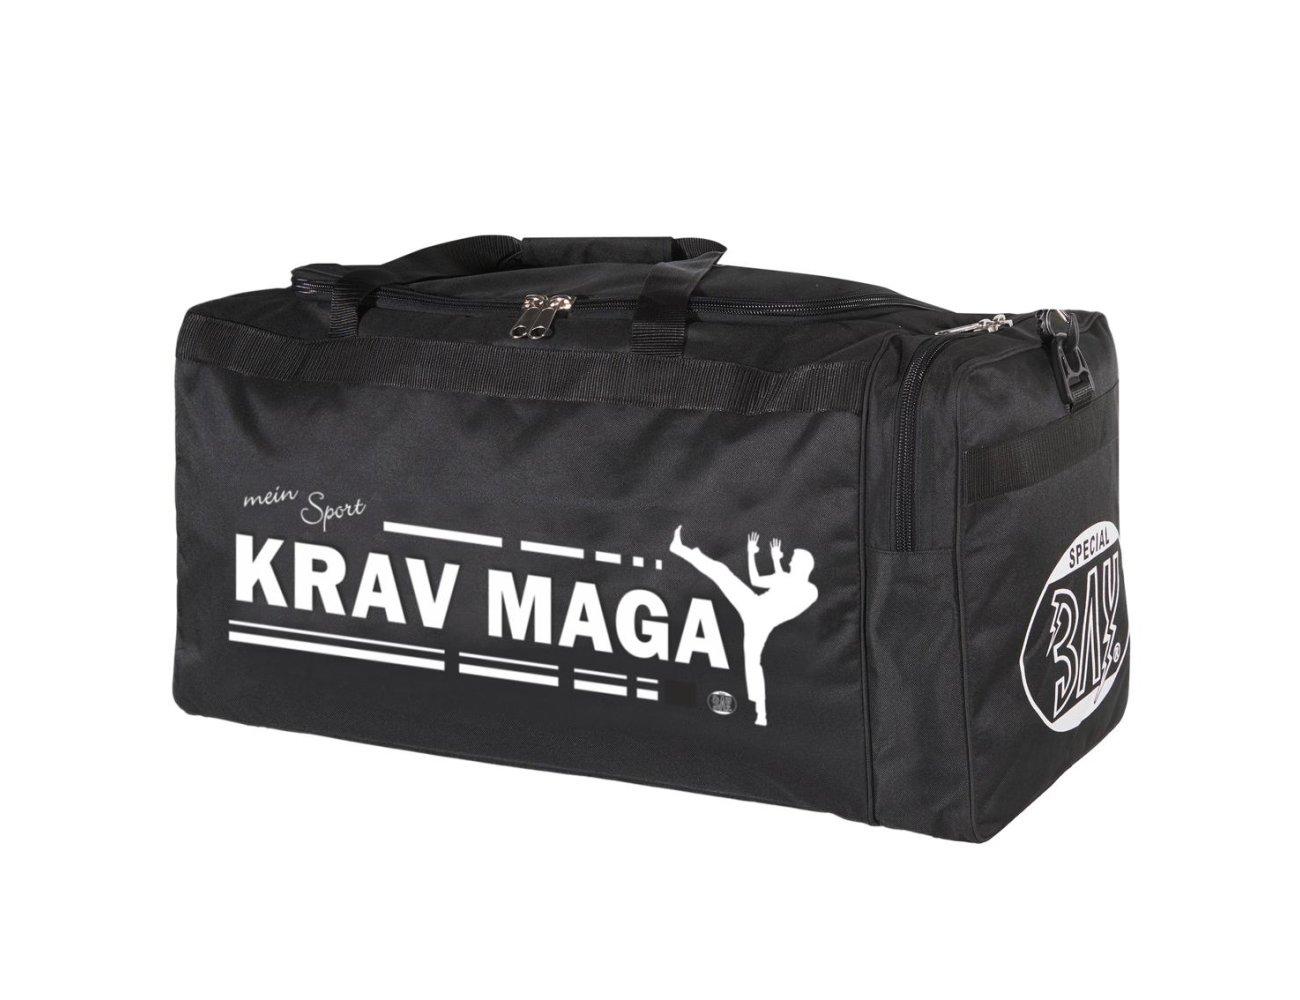 sporttaschen qualit t auswahl bay kampfsport 24 99. Black Bedroom Furniture Sets. Home Design Ideas